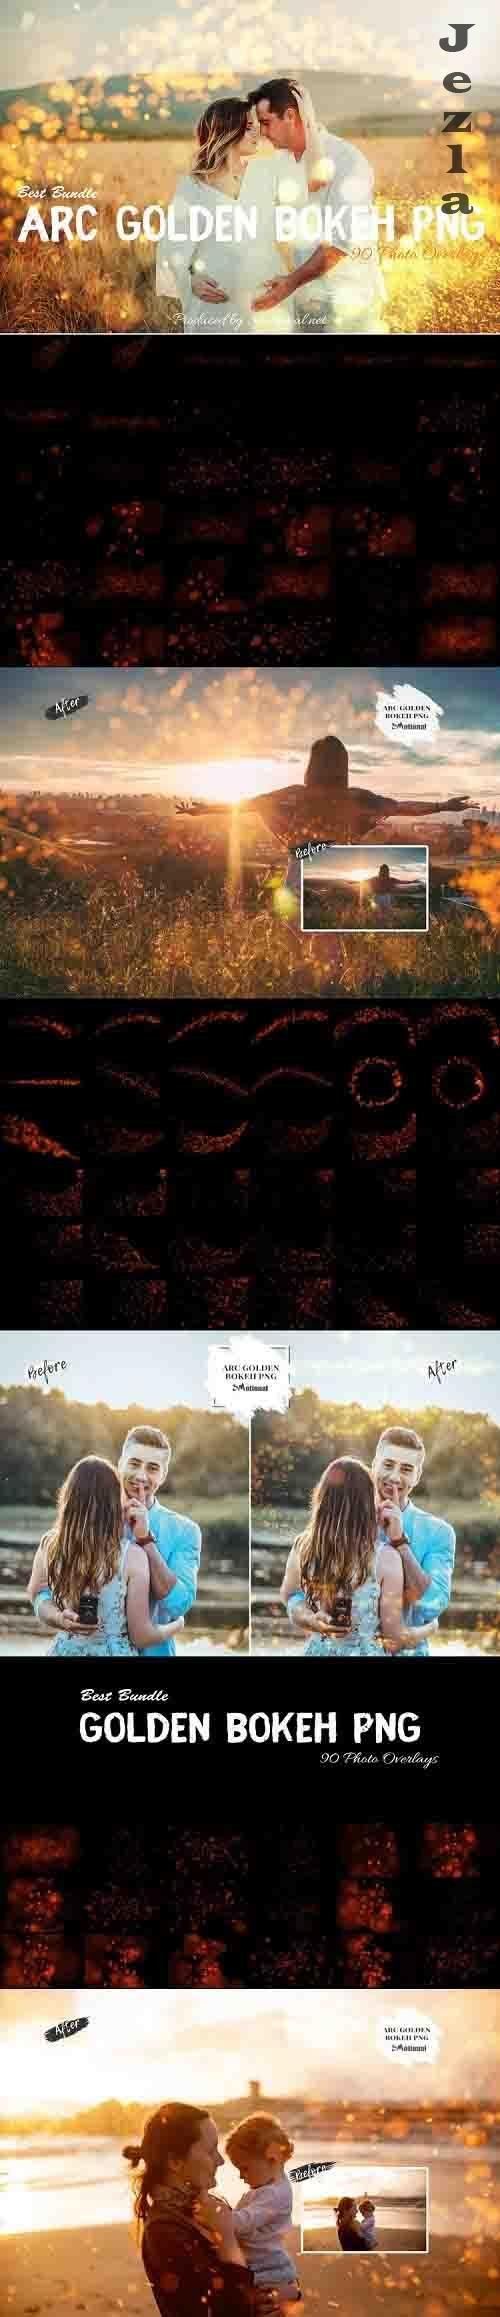 90 ARC Golden Bokeh PNG Effect Photo Overlays - 812936